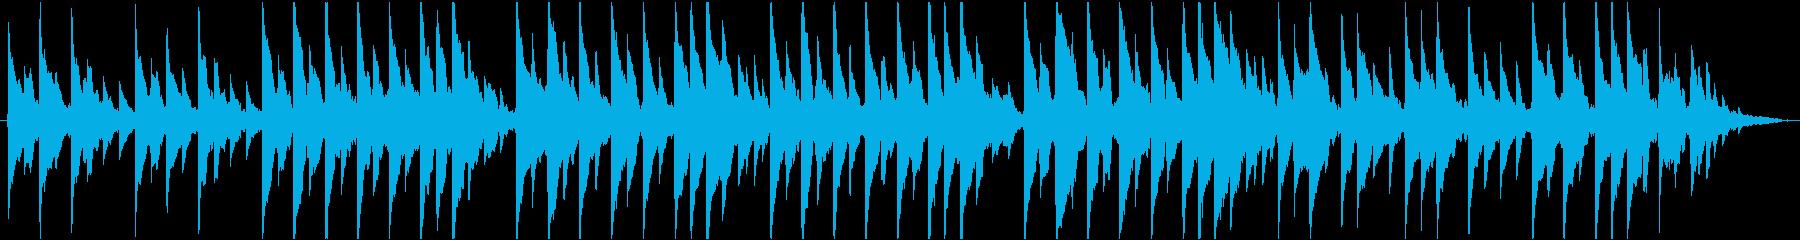 Sakura Sakura Music Box_Japanese, Seasons, Four Seasons's reproduced waveform